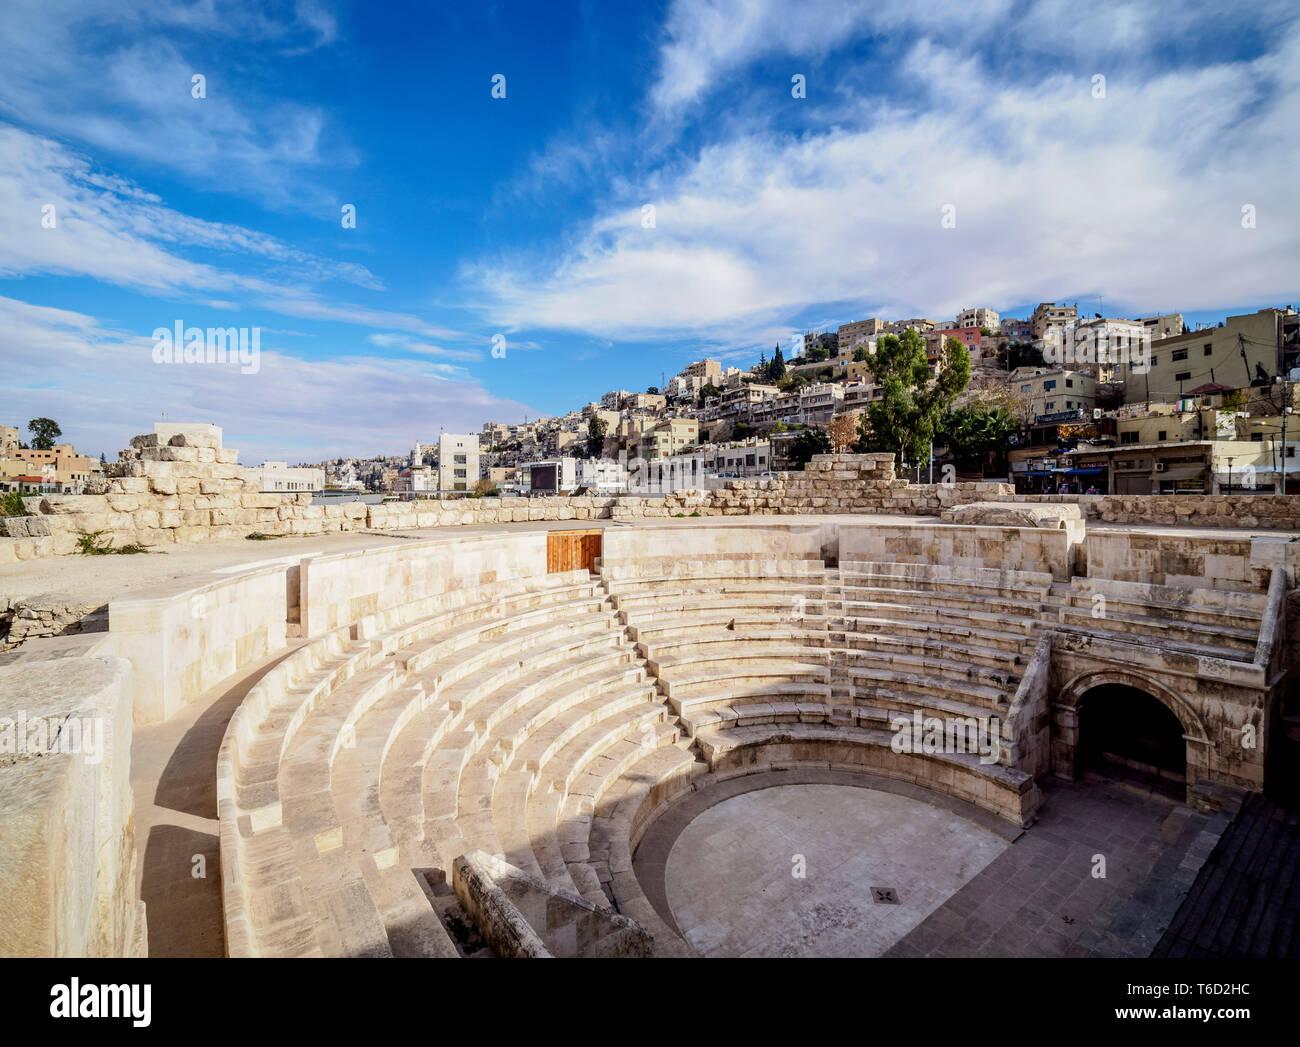 Roman Odeon Theater, Amman, Amman Governorate, Jordan - Stock Image